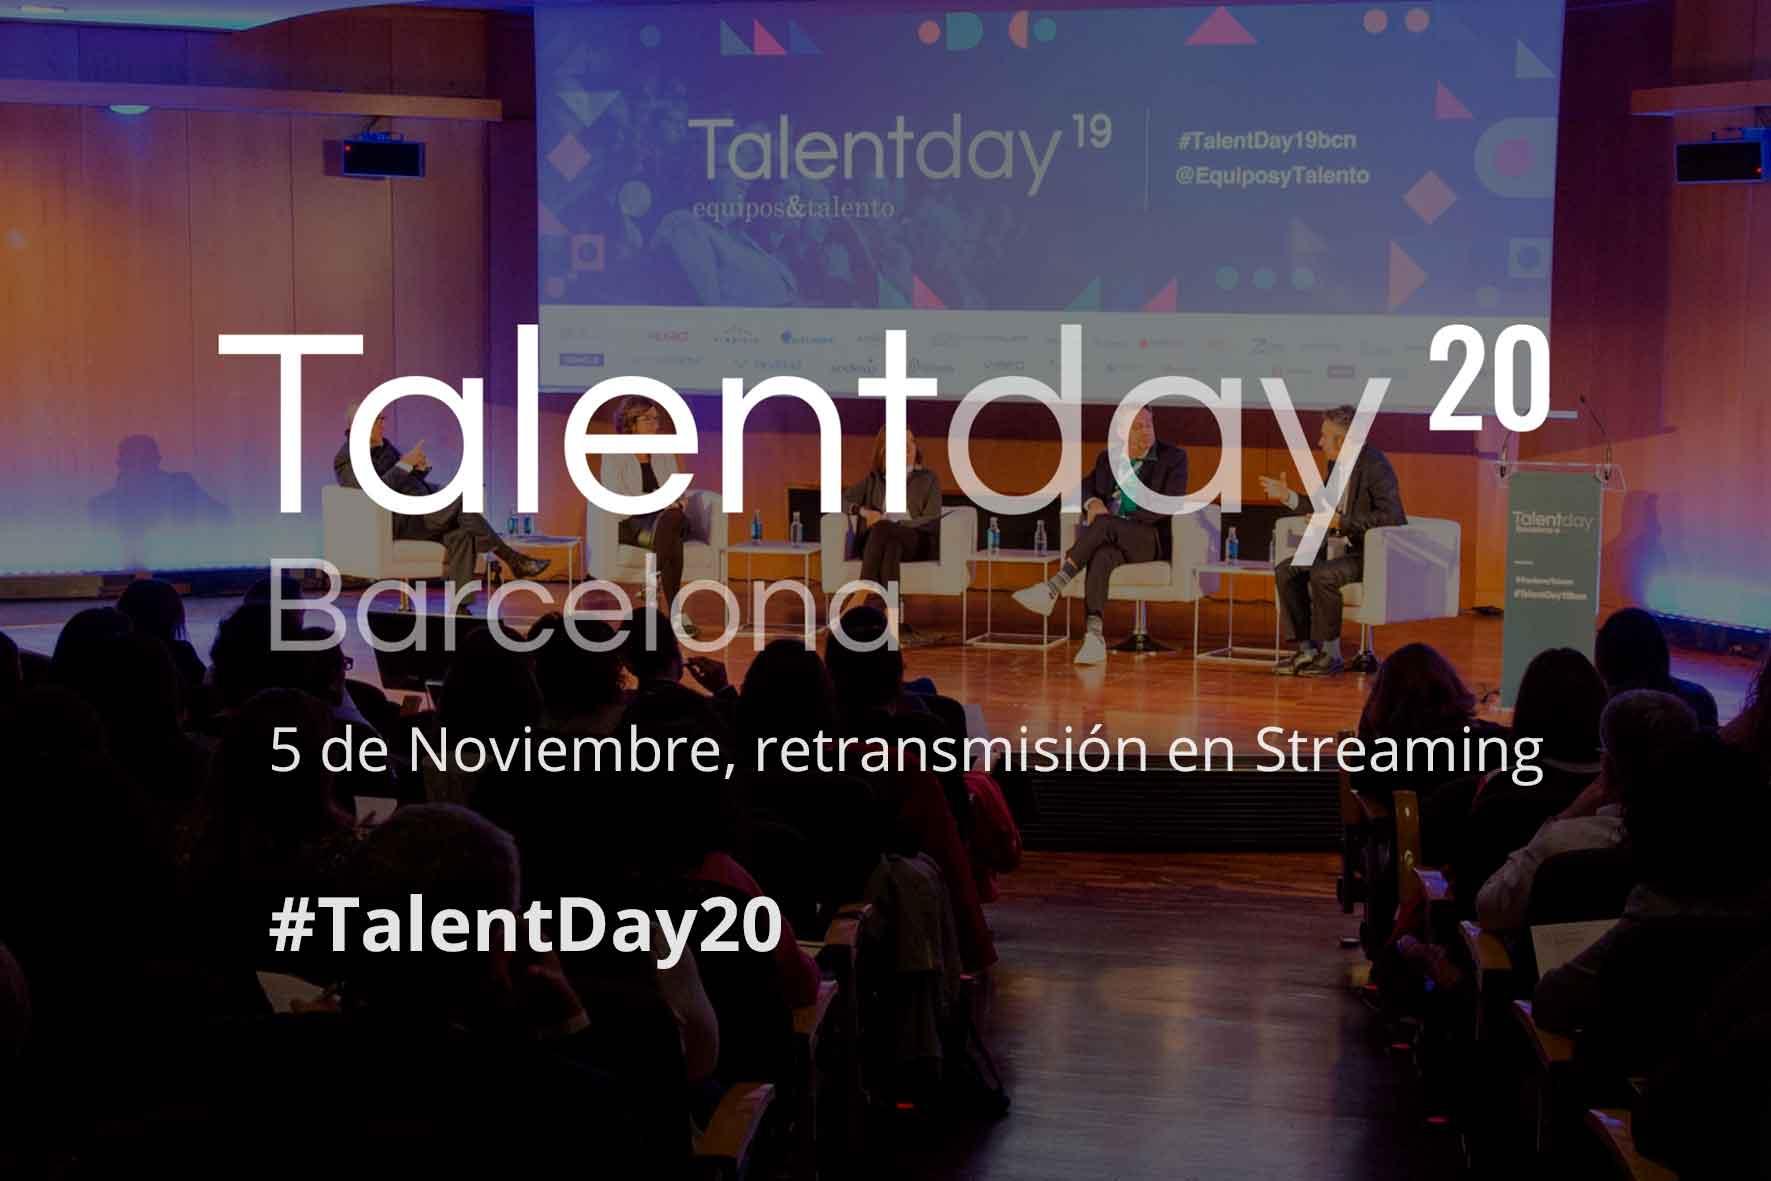 Participaremos en el Talent Day Barcelona 2020: Reconnecting People & Reinventing Organizations